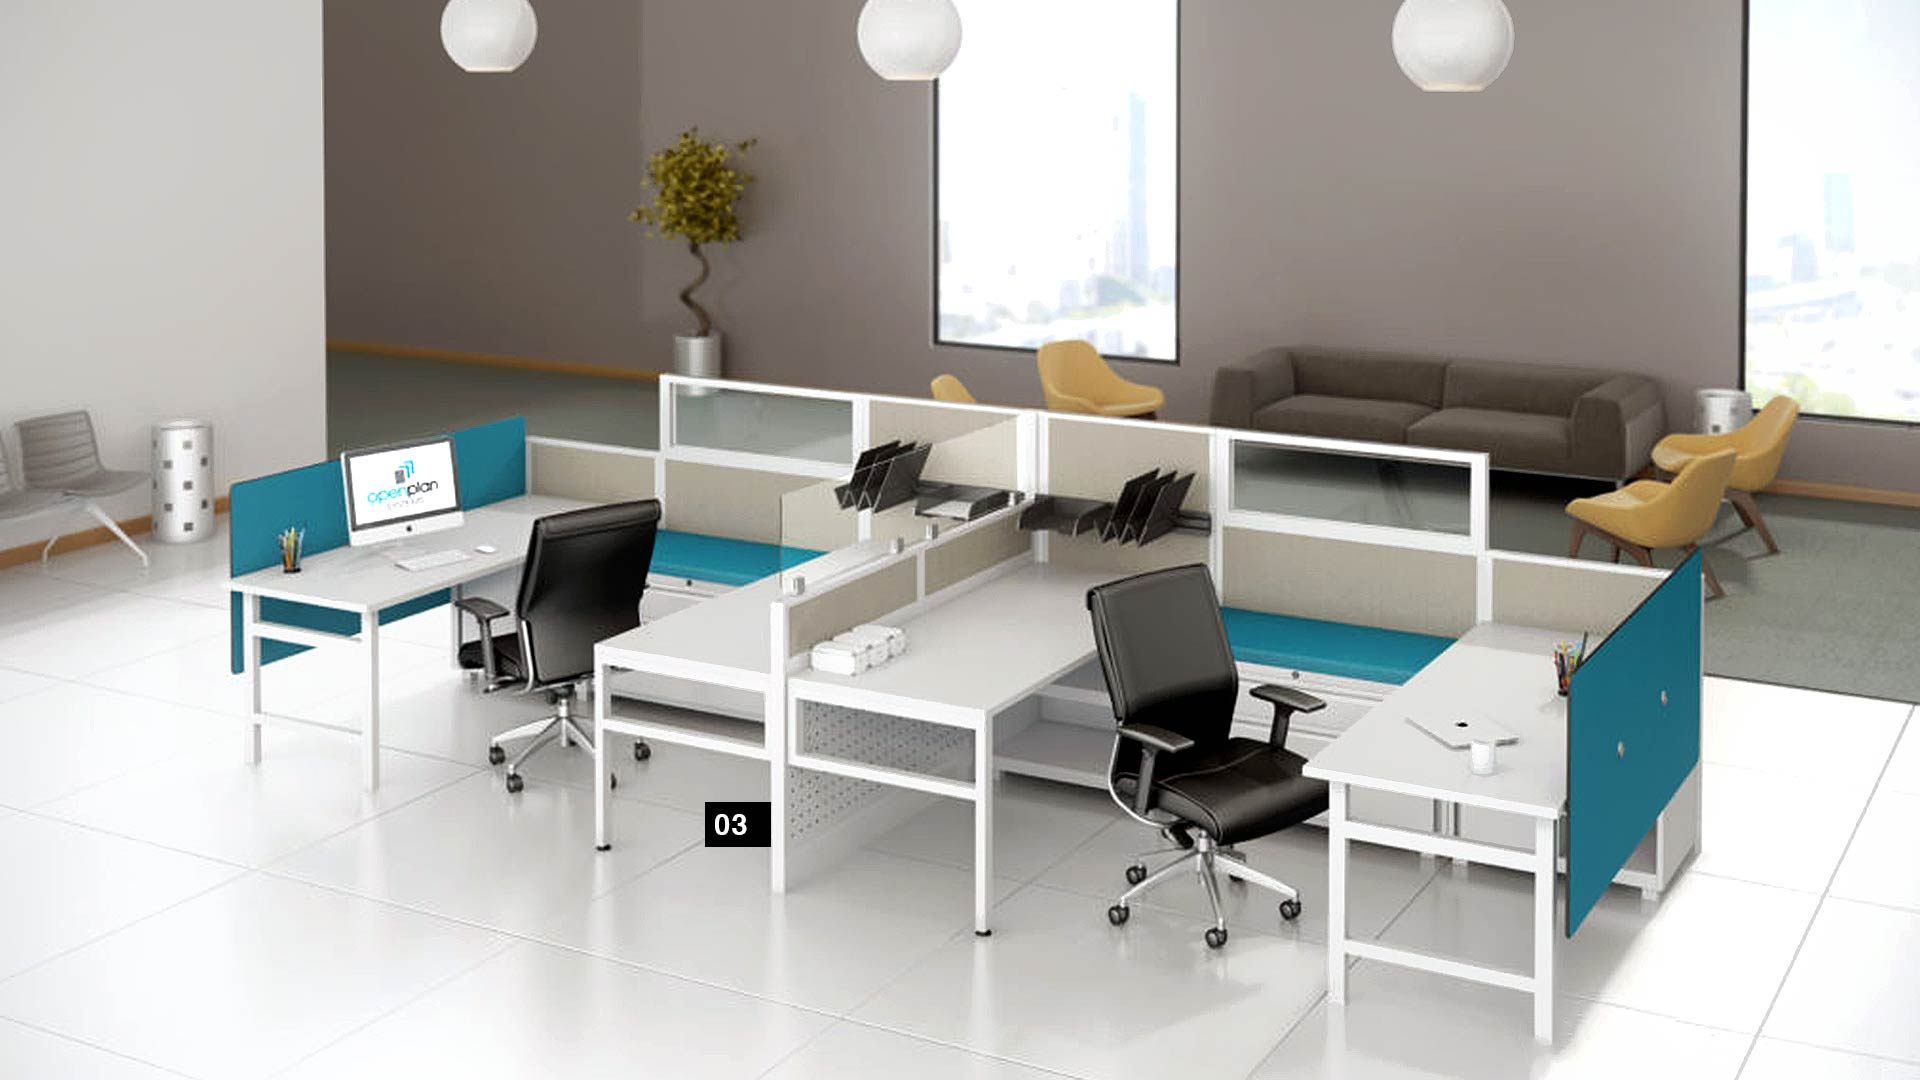 office-cubicles-open-plan-razor-1